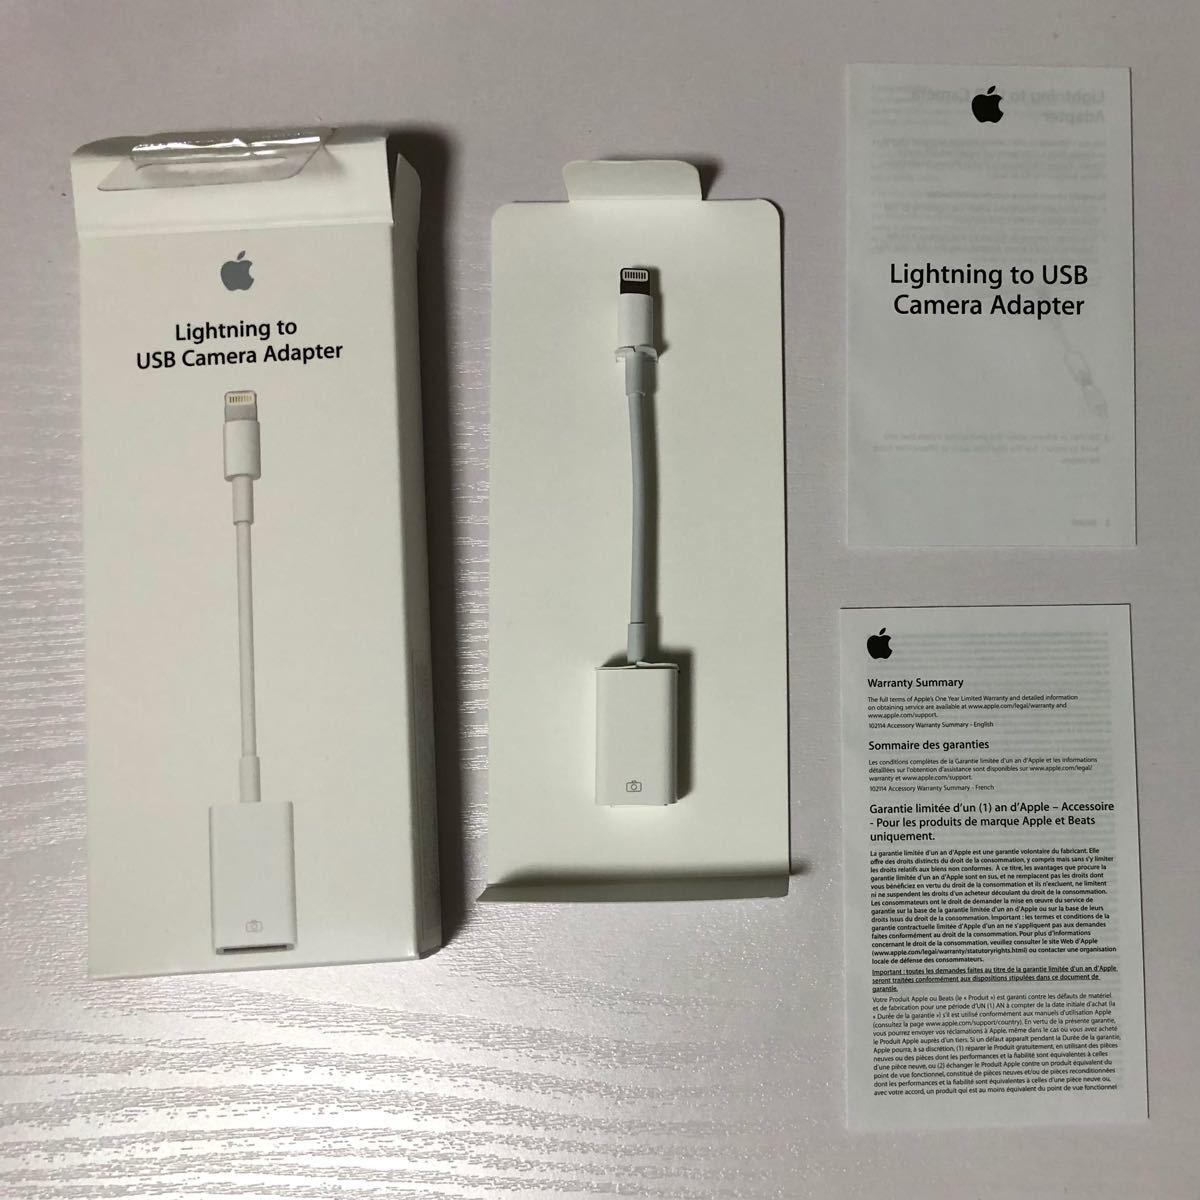 Apple アップル 純正 Lightning USB カメラアダプタ 変換 ケーブル iPhone/iPad/iPod